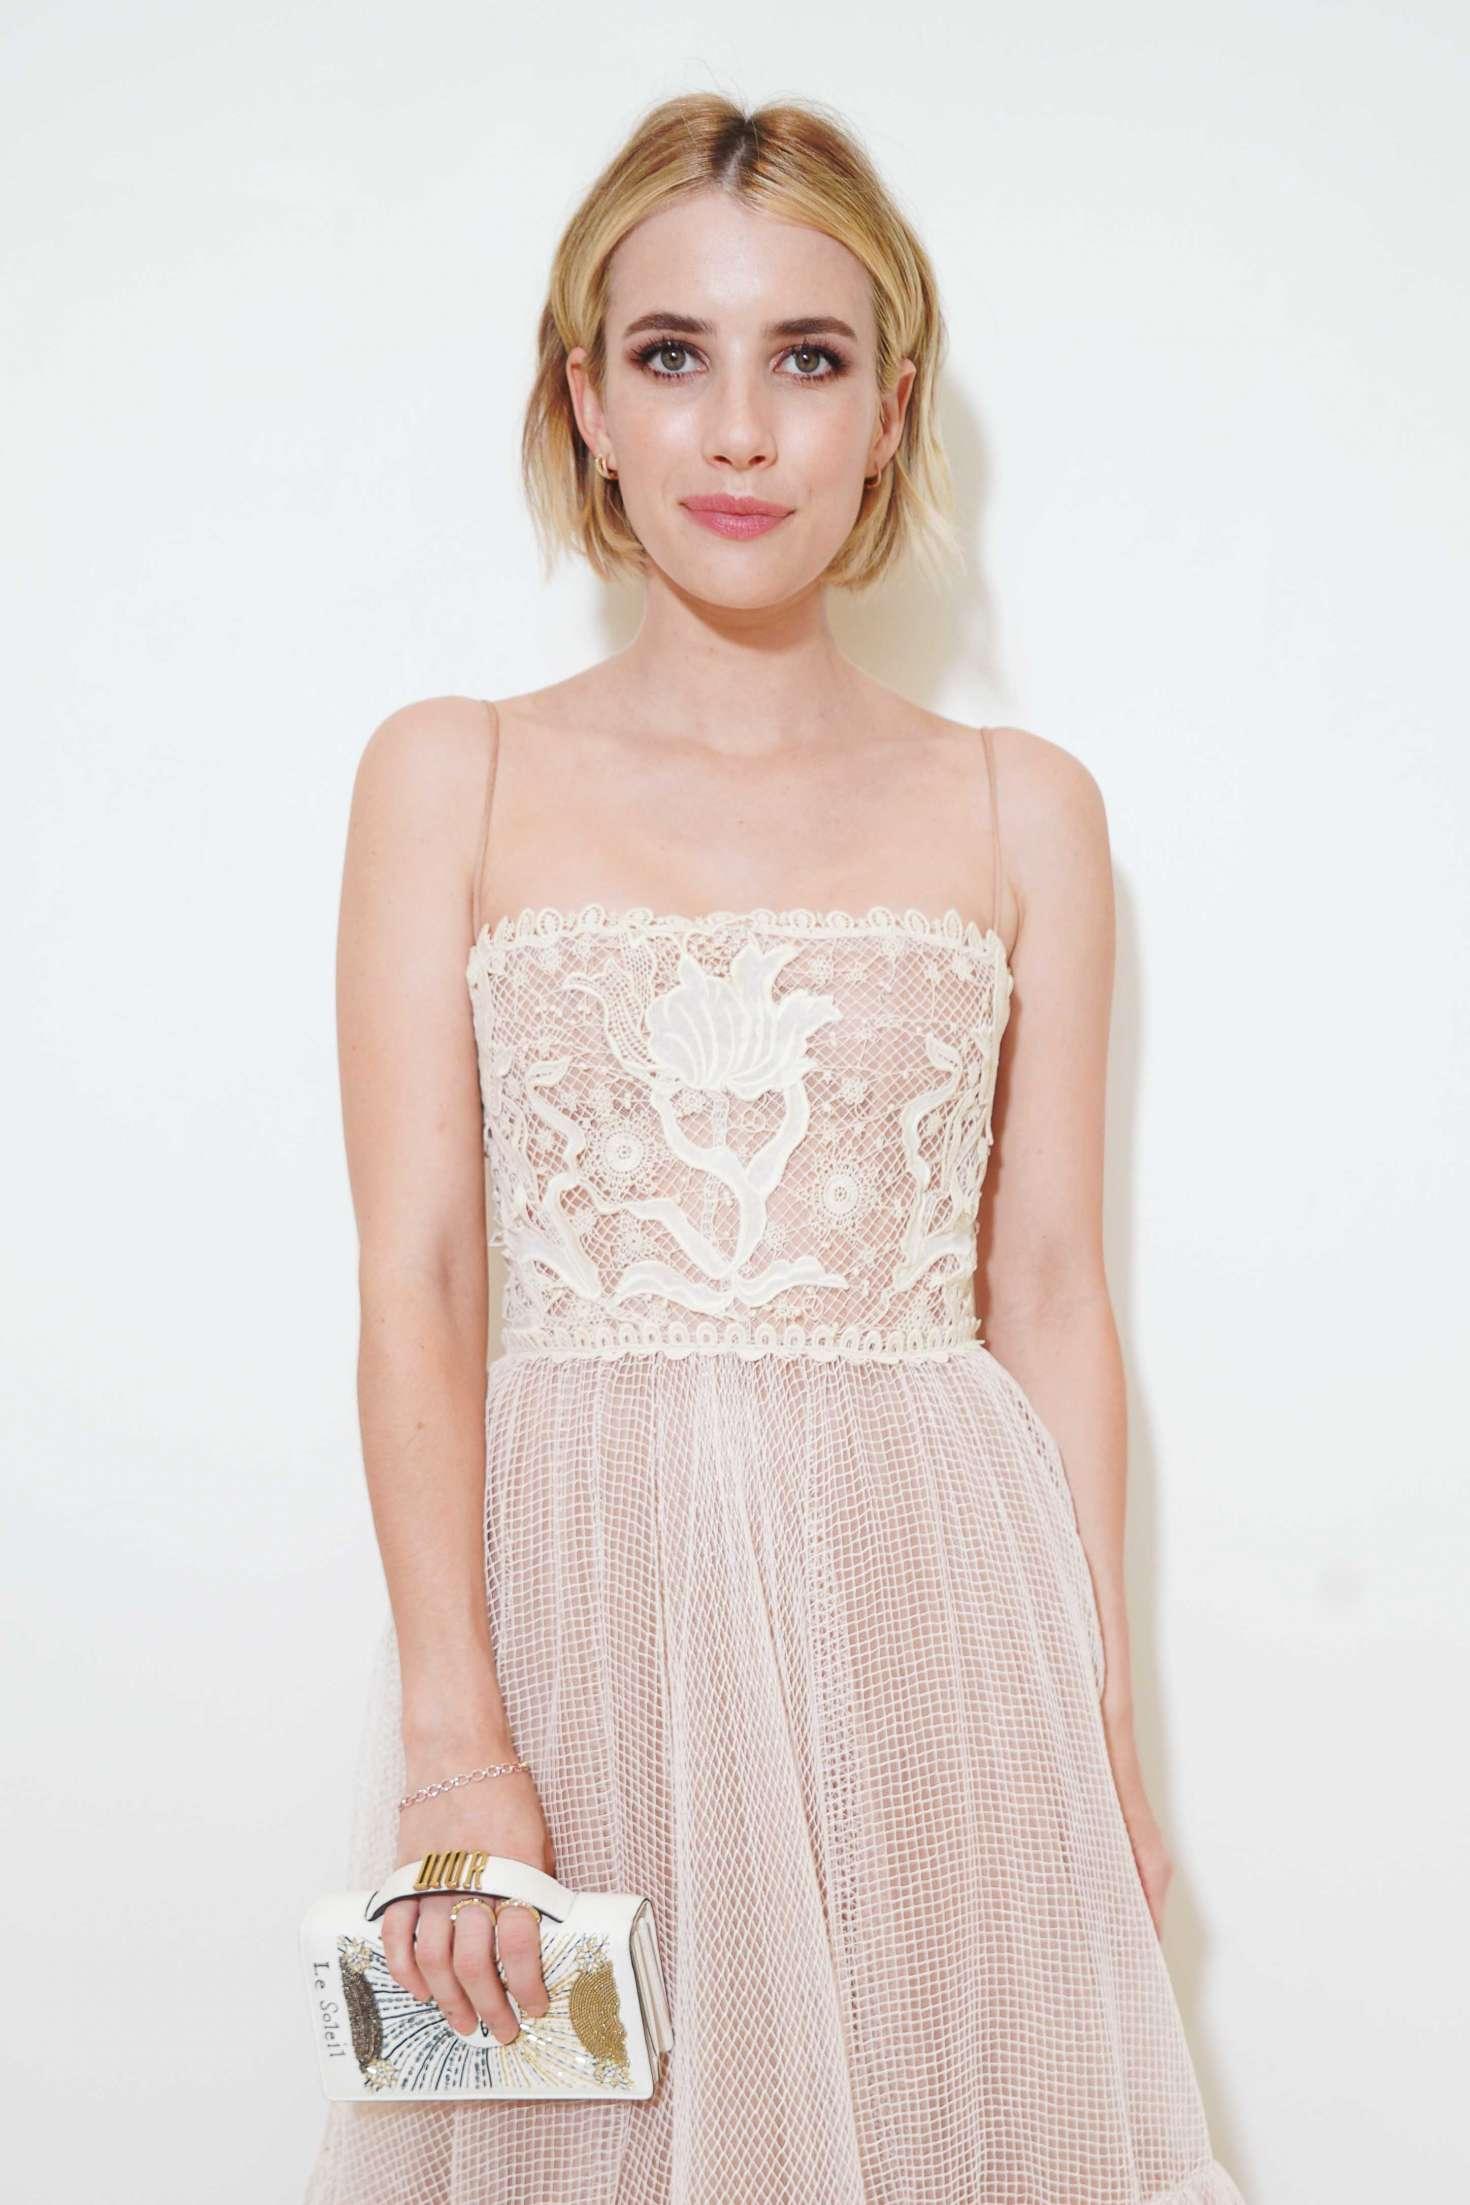 Emma Roberts - Christian Dior Haute Couture Show 2019 in Paris